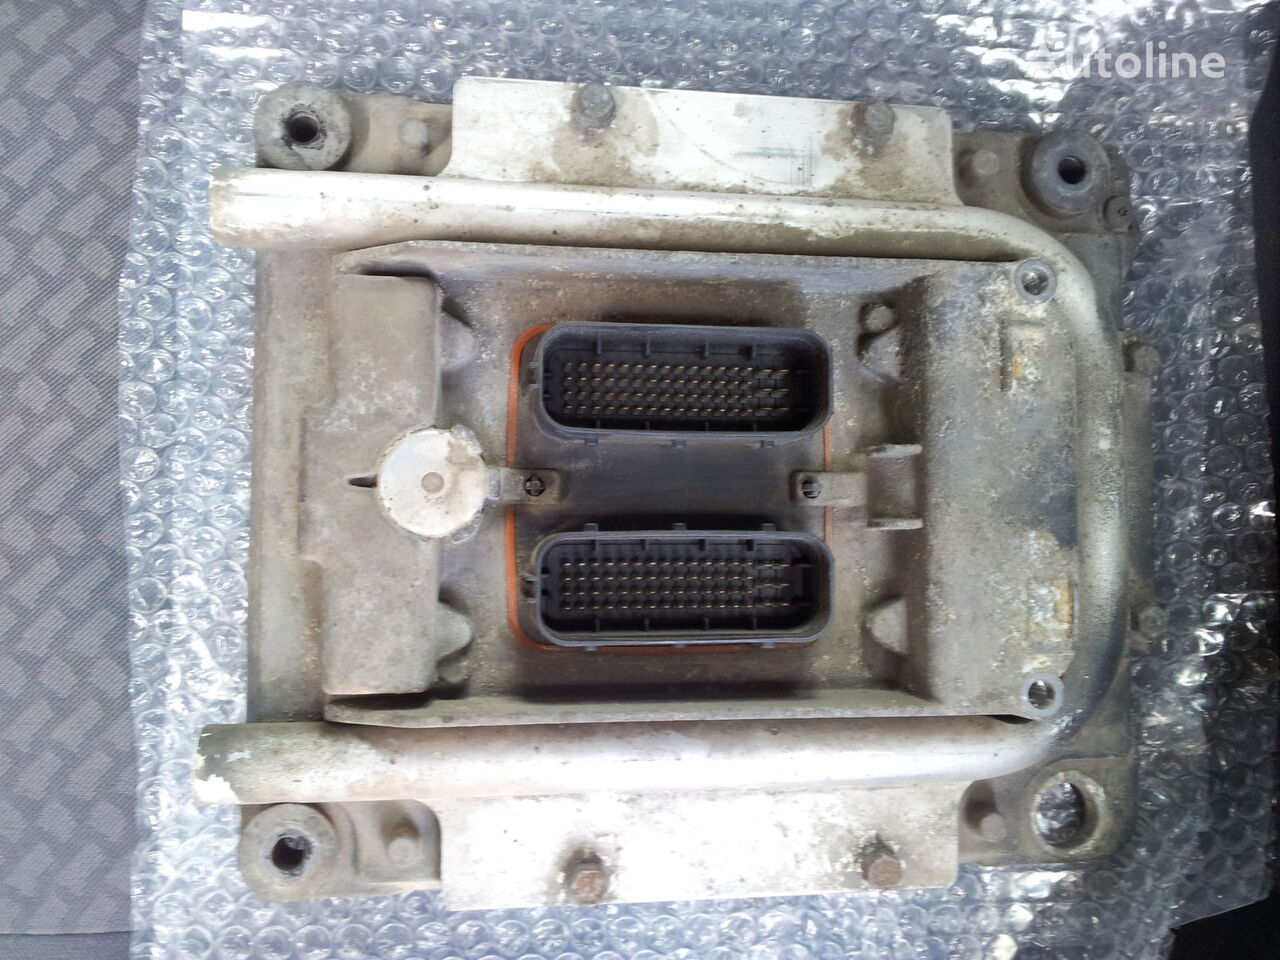 панелен блок  Renault VOLVO FH13, ECU control unit, 440PS, engine control unit, 20561252 P02, 20814604, 20977019, 21300122, 85123379, 85111591, 85110111, 85000776, 85000847, 85003360 за влекач RENAULT Premium DXI